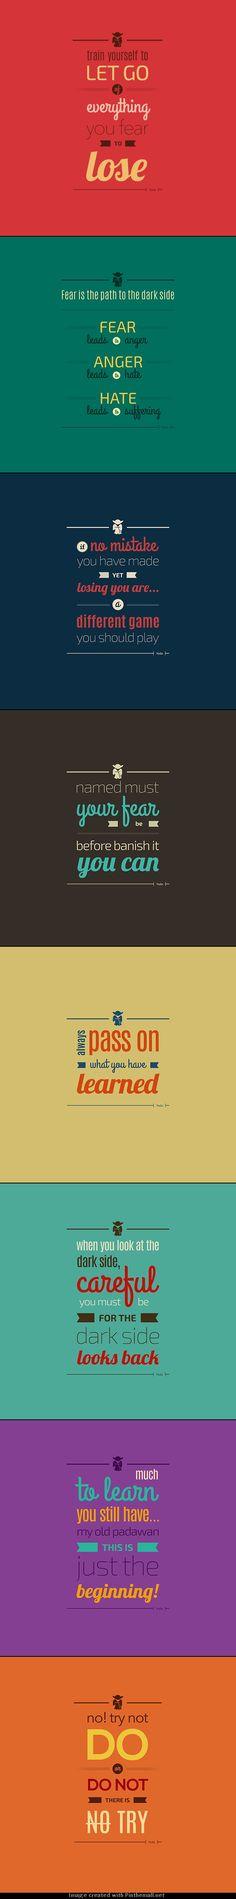 Yoda quotes by Navdeep Raj